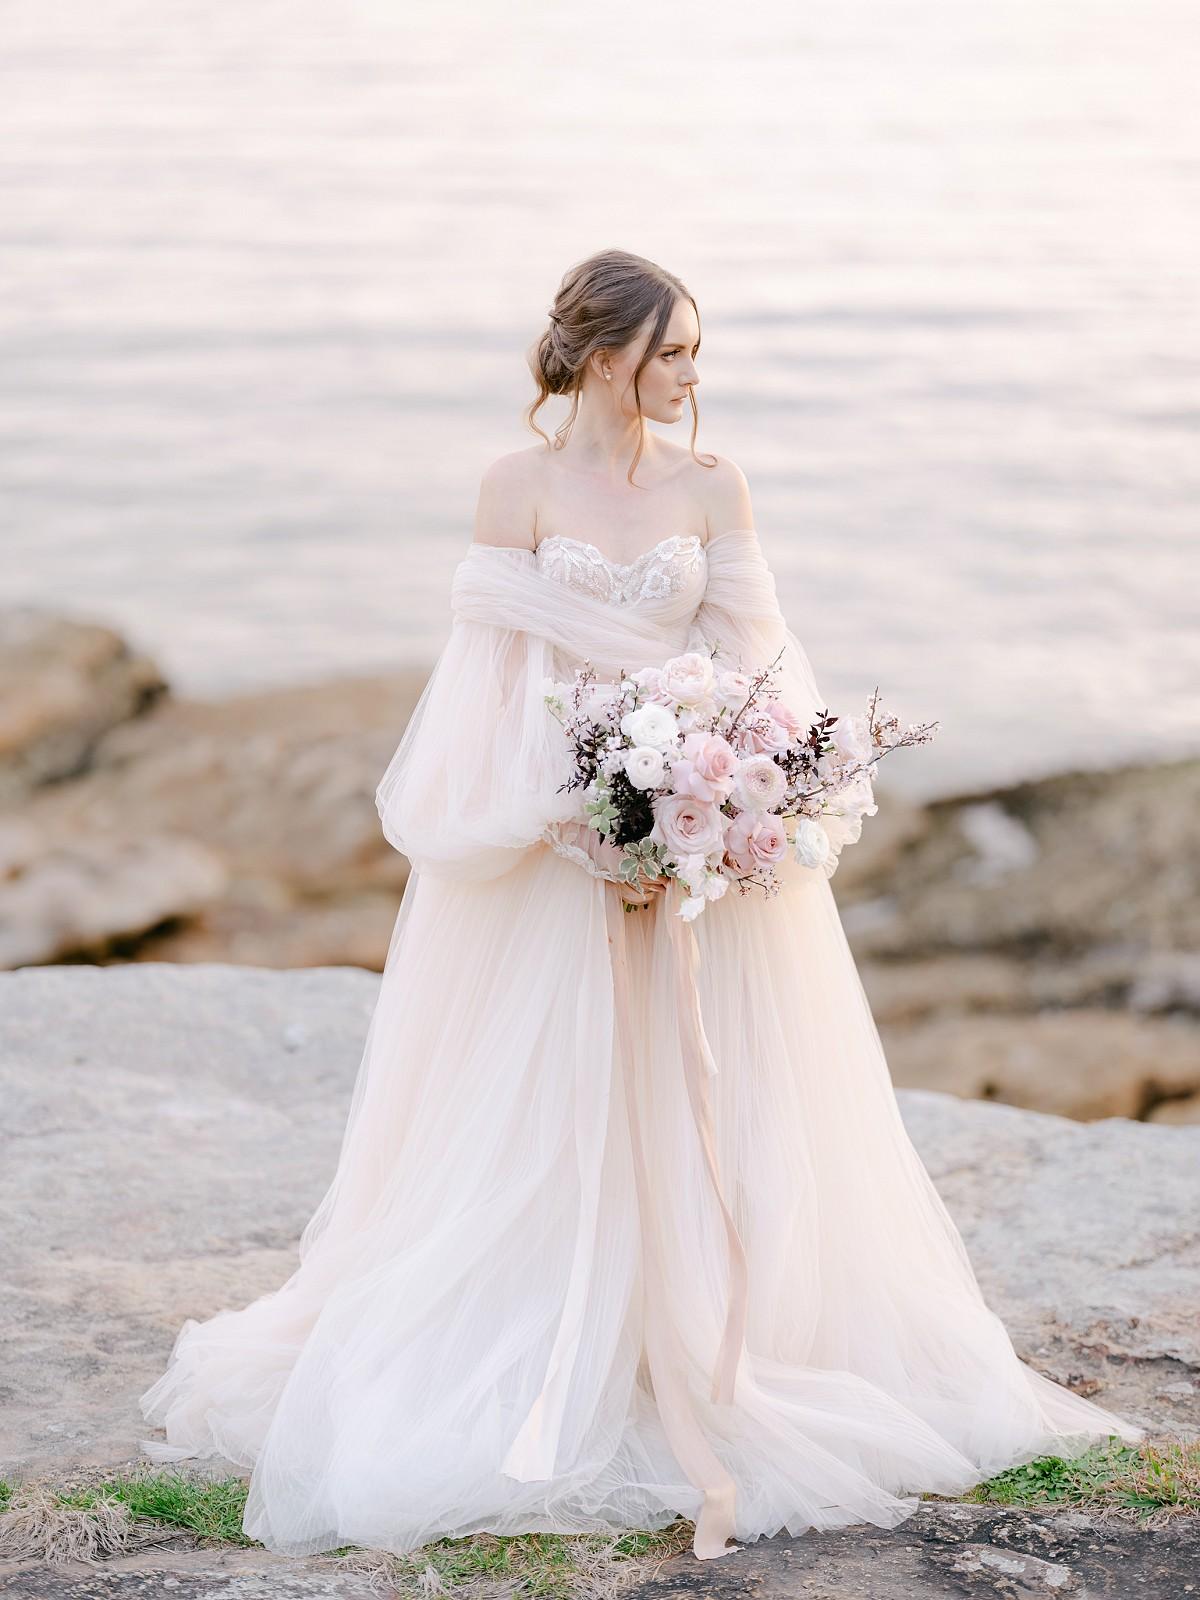 Galia Lahav dress in blush pink